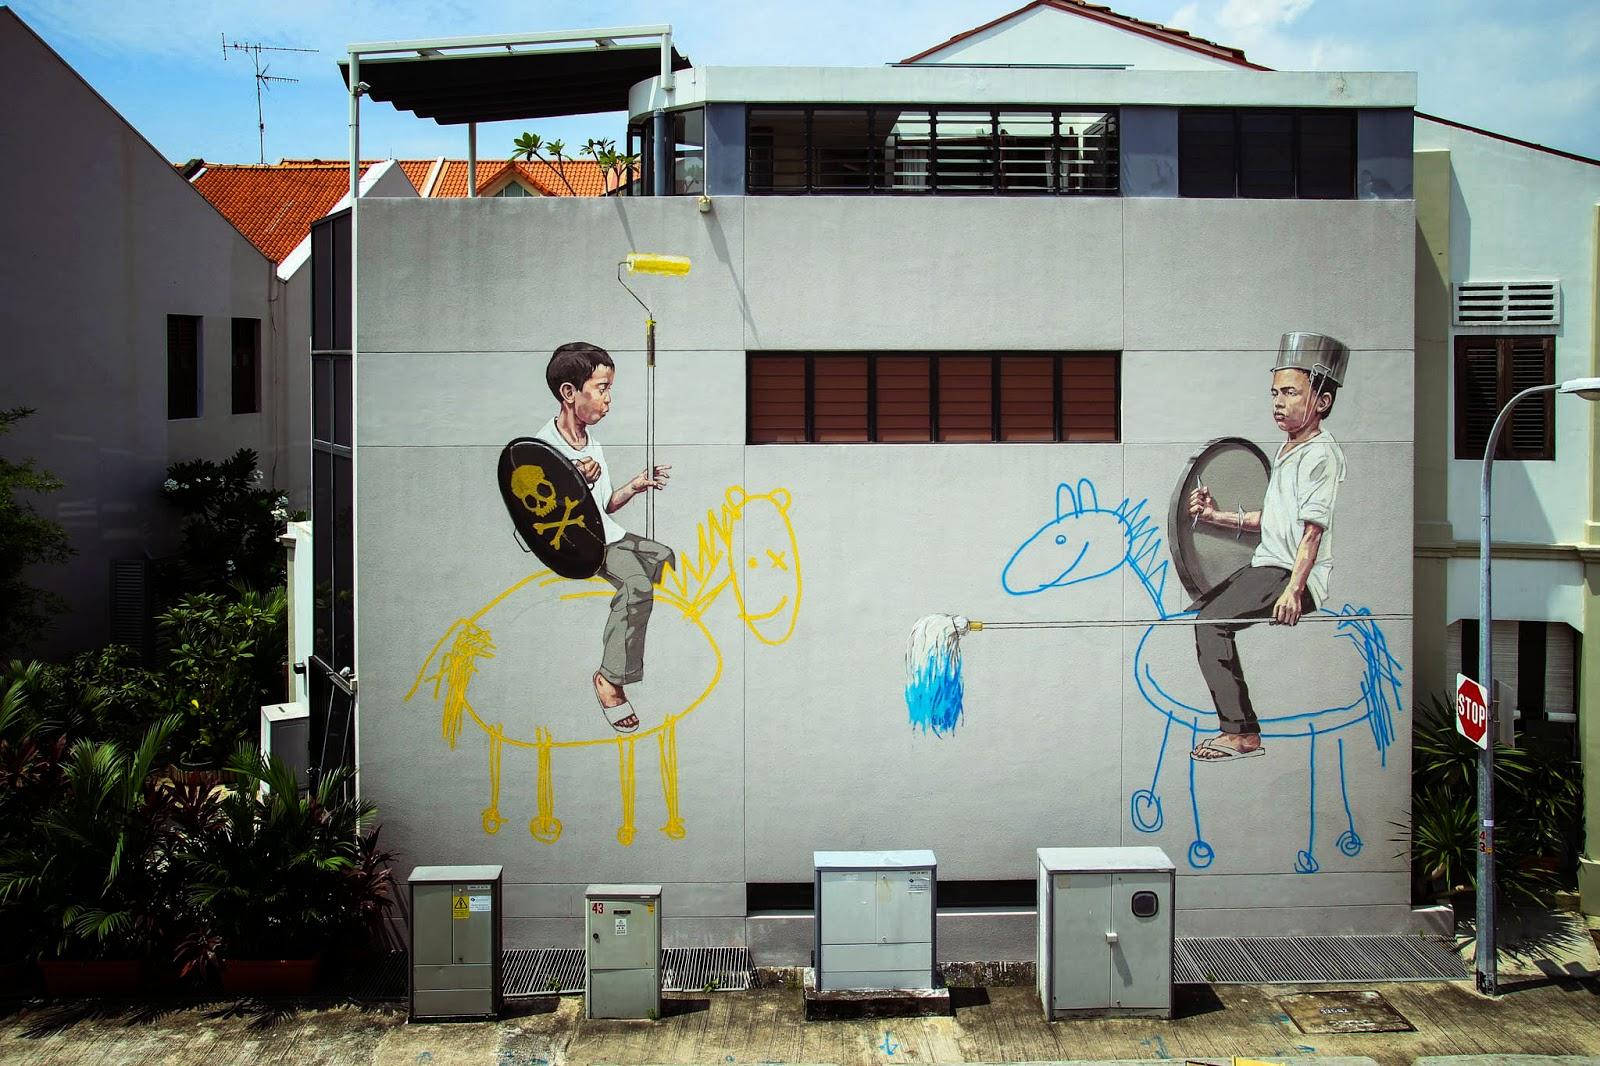 ernest-zacharevic-new-pieces-singapore-city-01